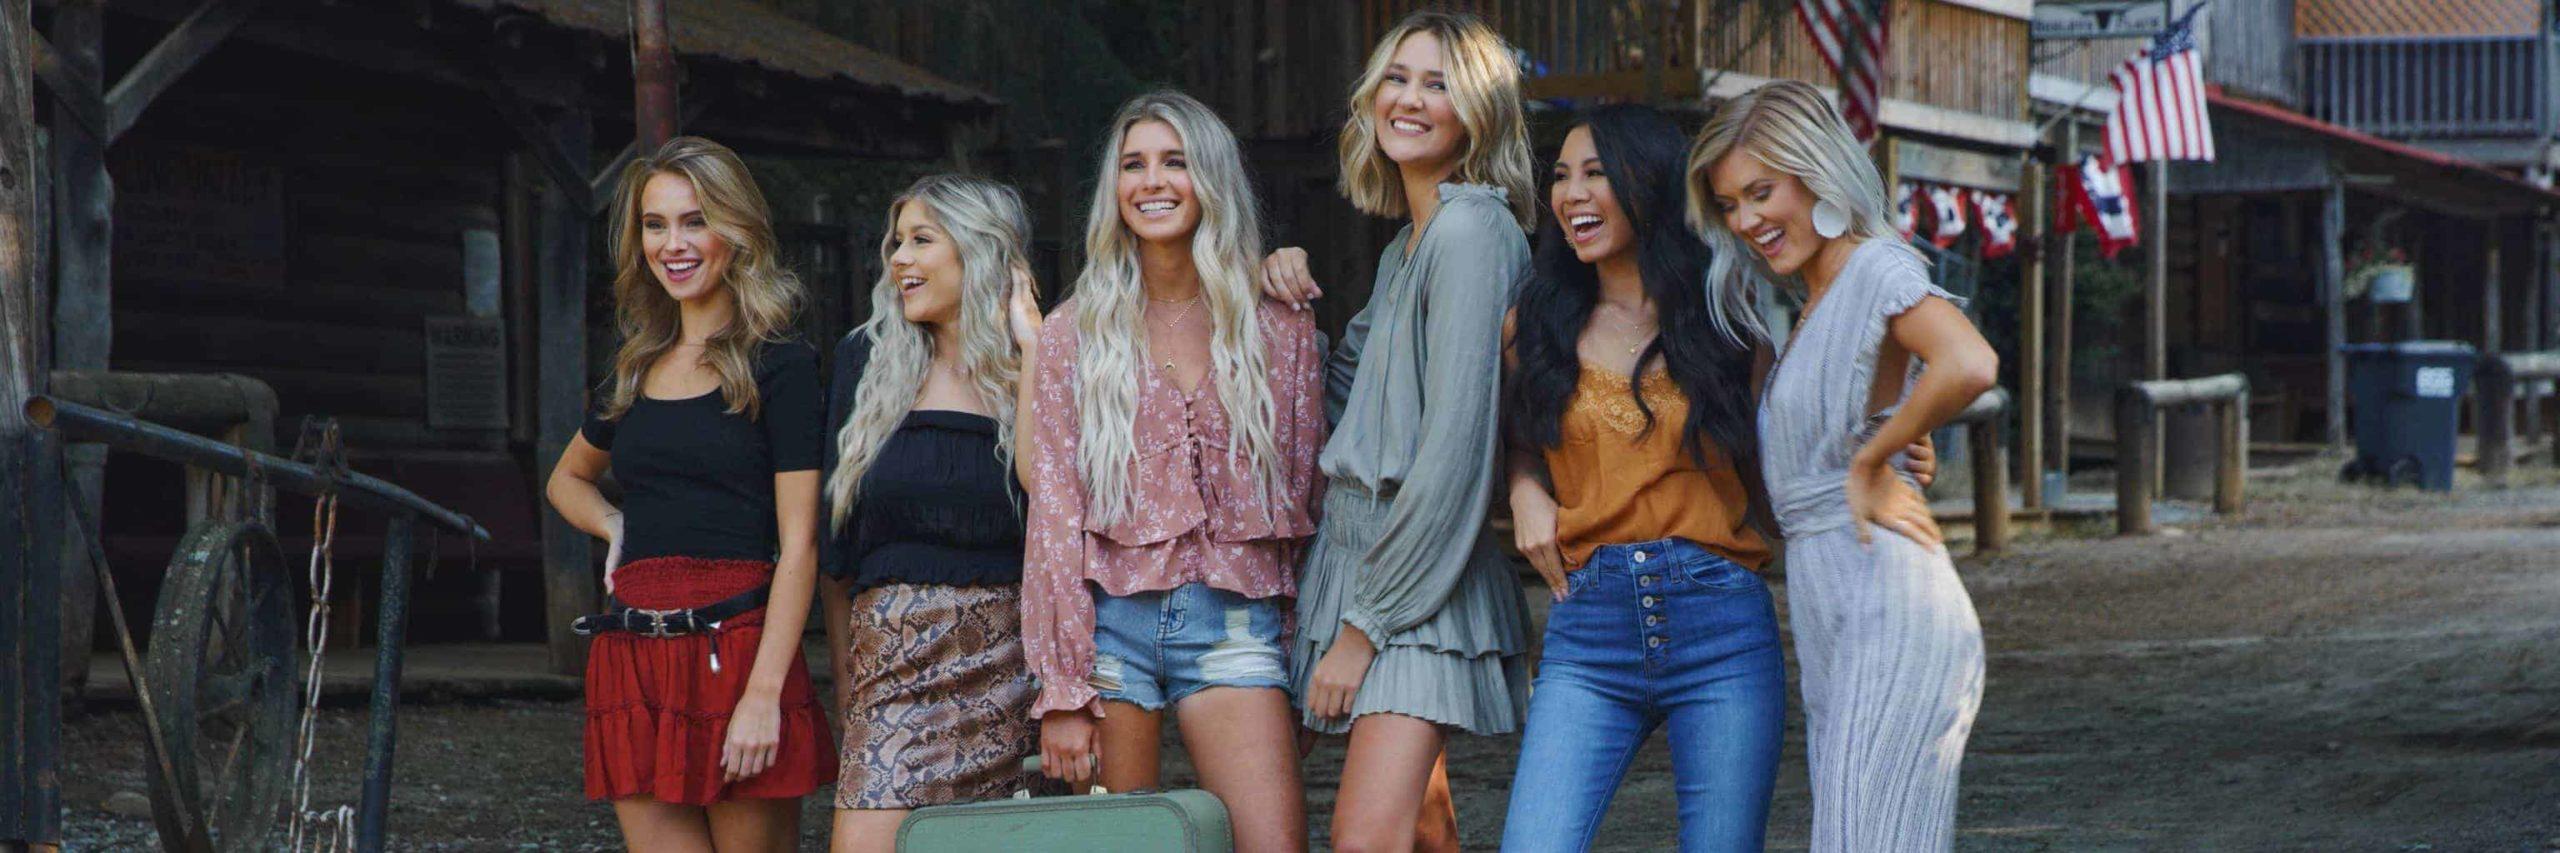 Six girls joyfully pose beside each other.